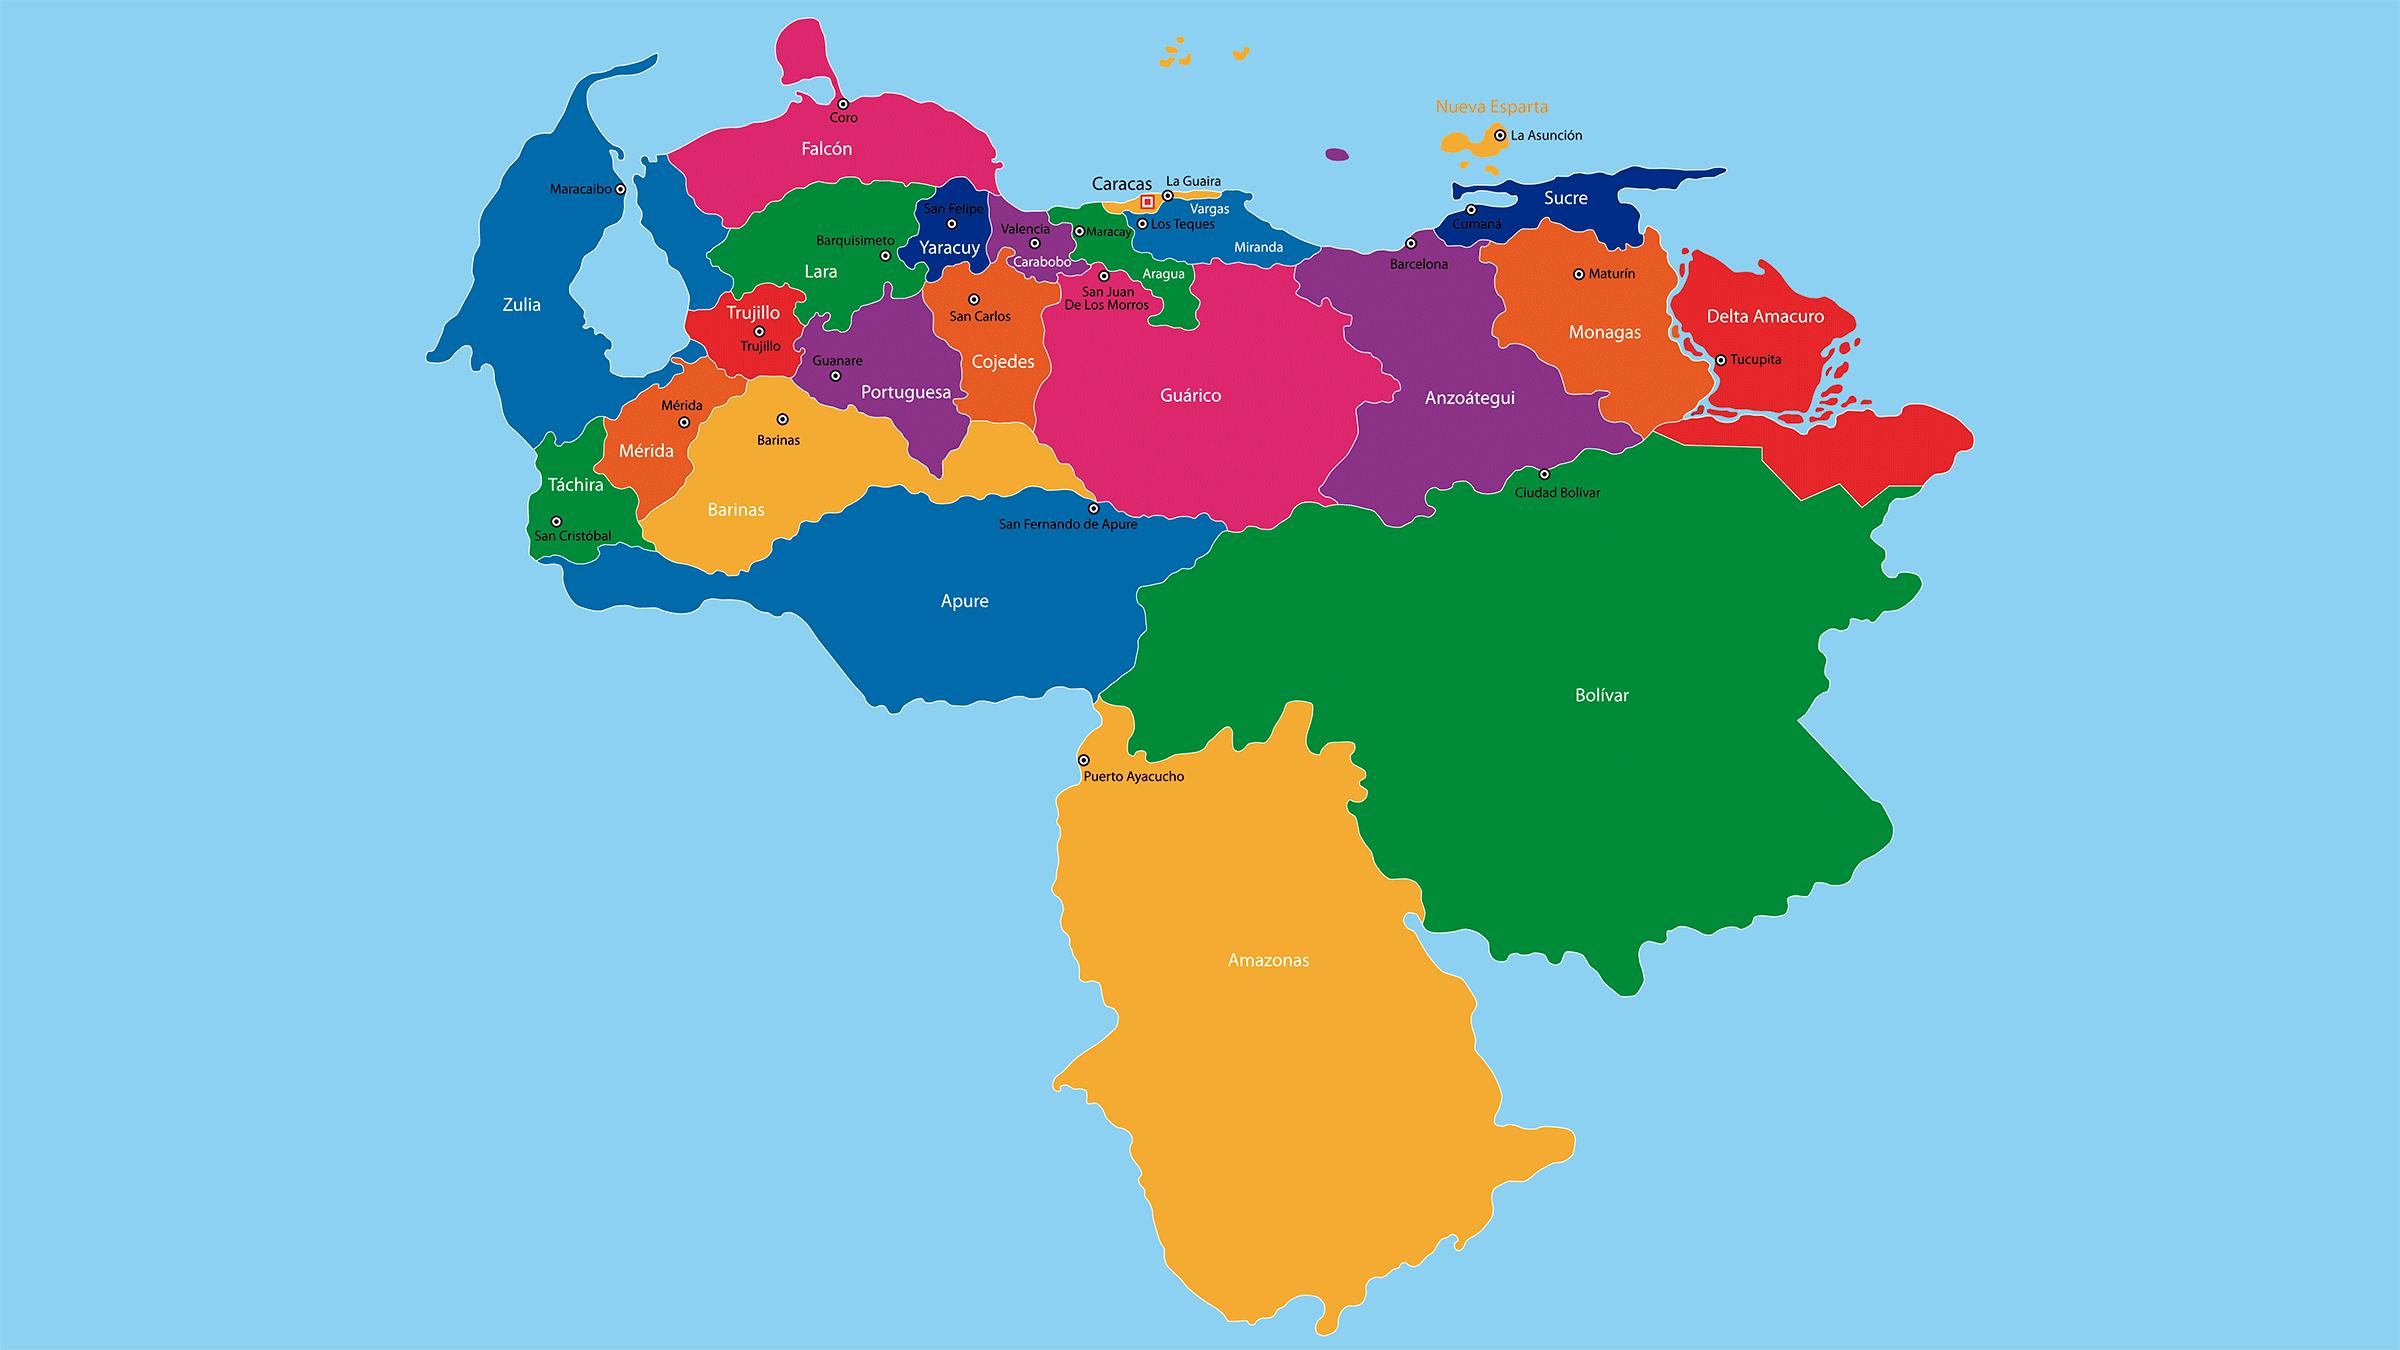 venezuela mapa Mapa político de Venezuela venezuela mapa